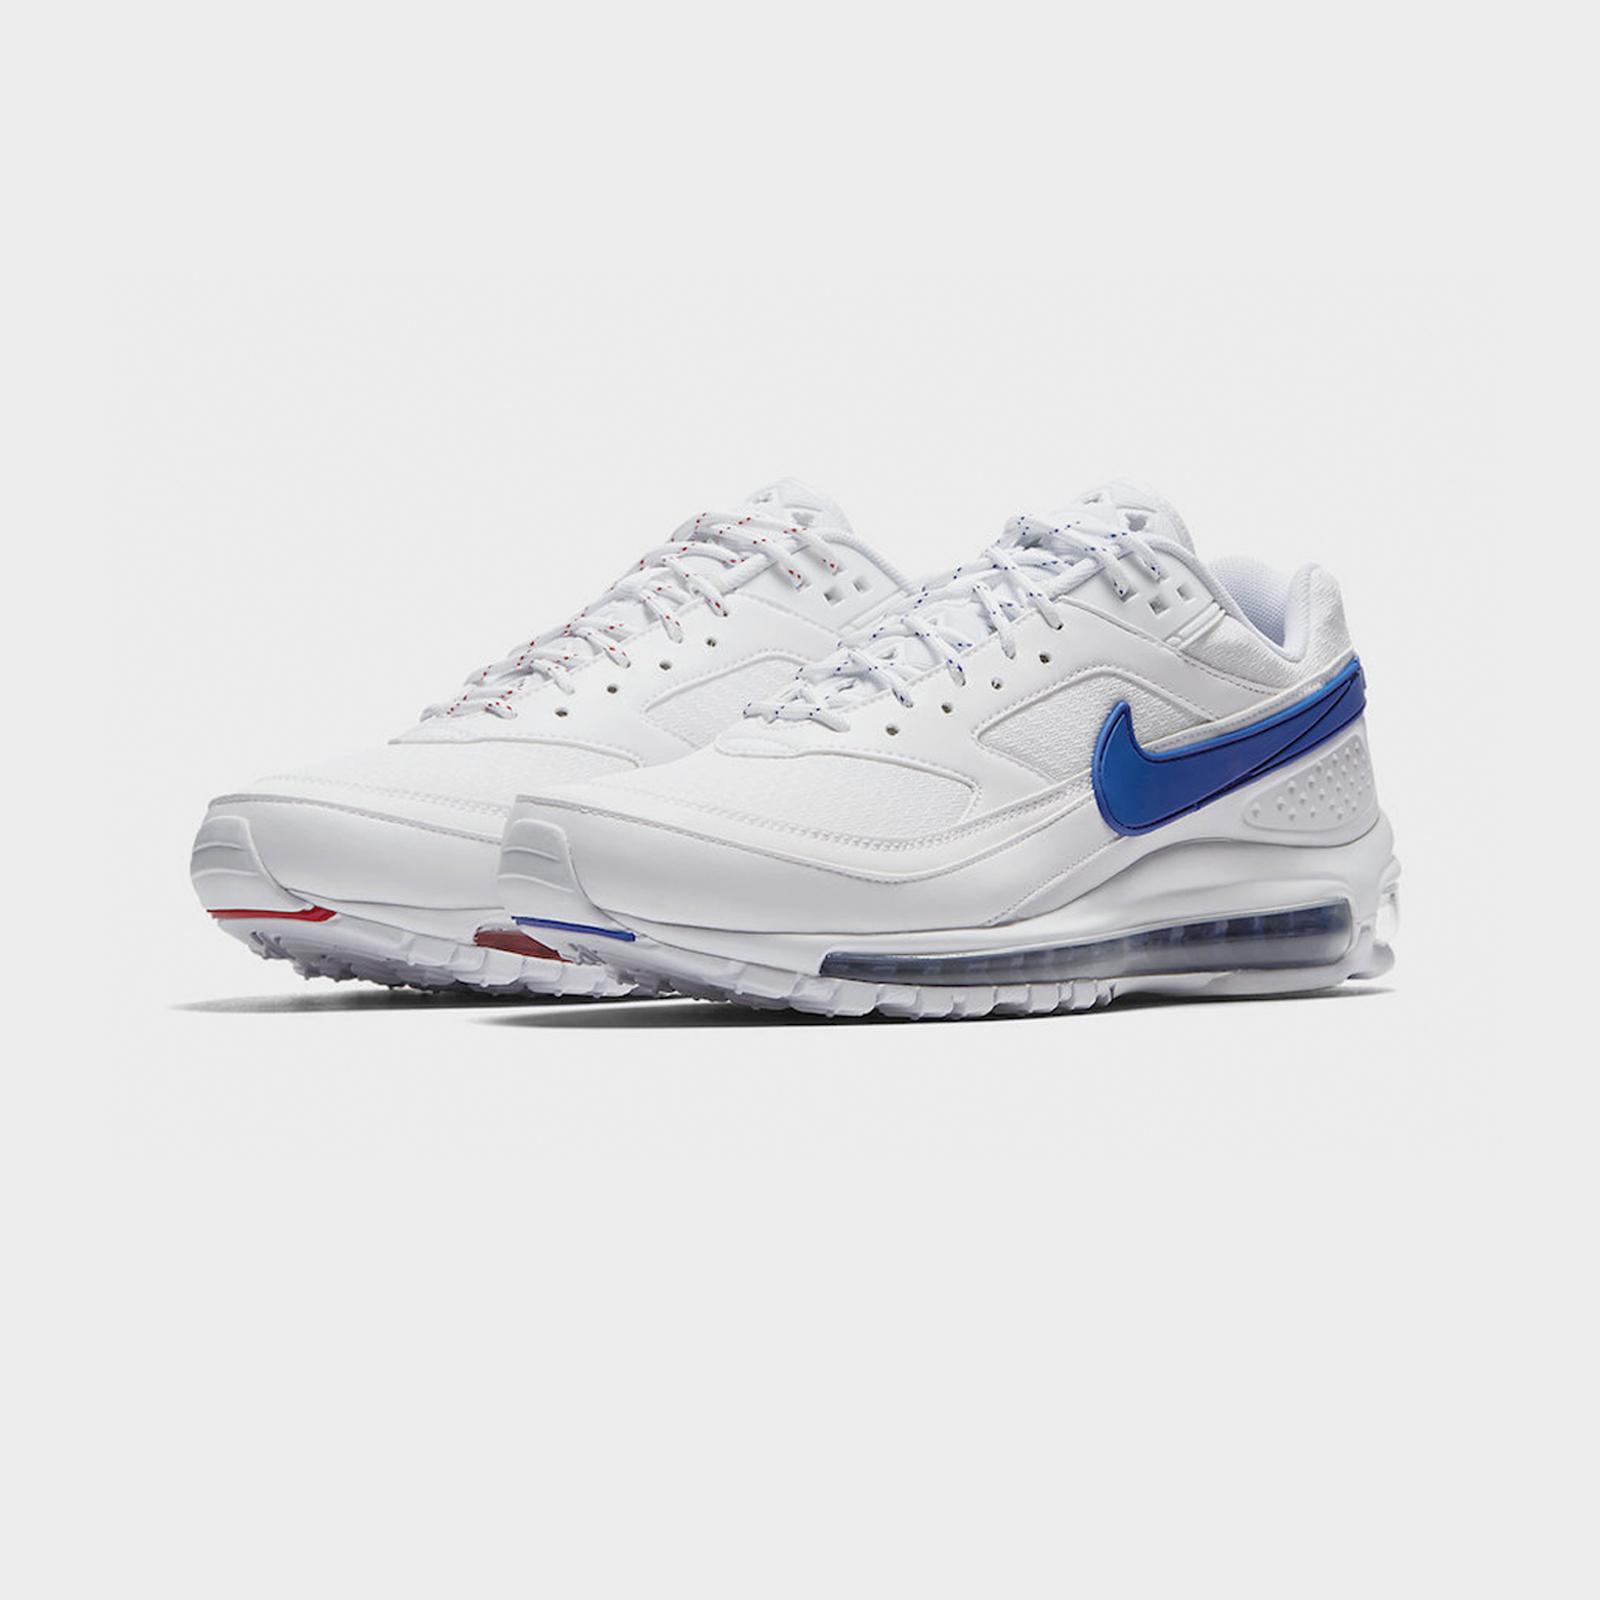 best sneakers a4e06 f49e4 Nike Sportswear Air Max 97 BW x Skepta